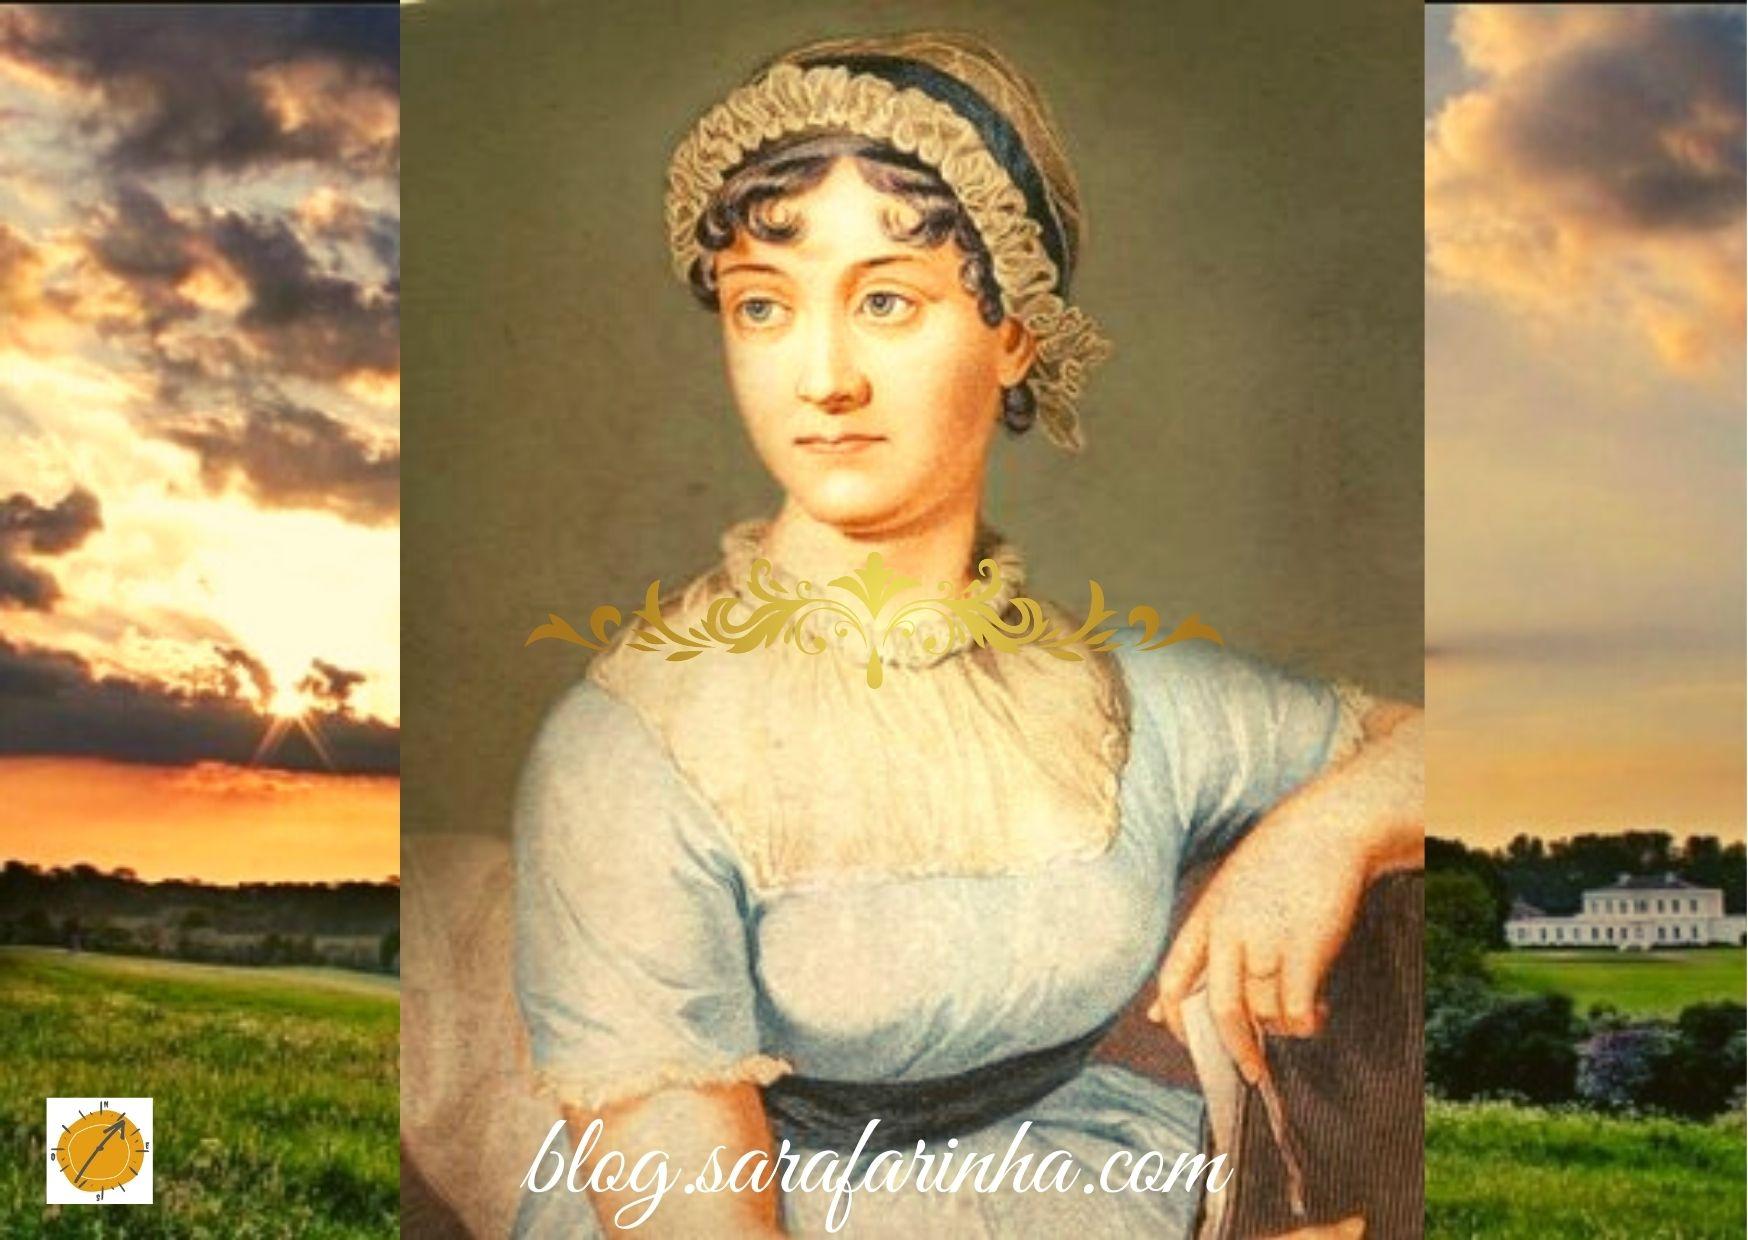 Jane Austen and Pemberley